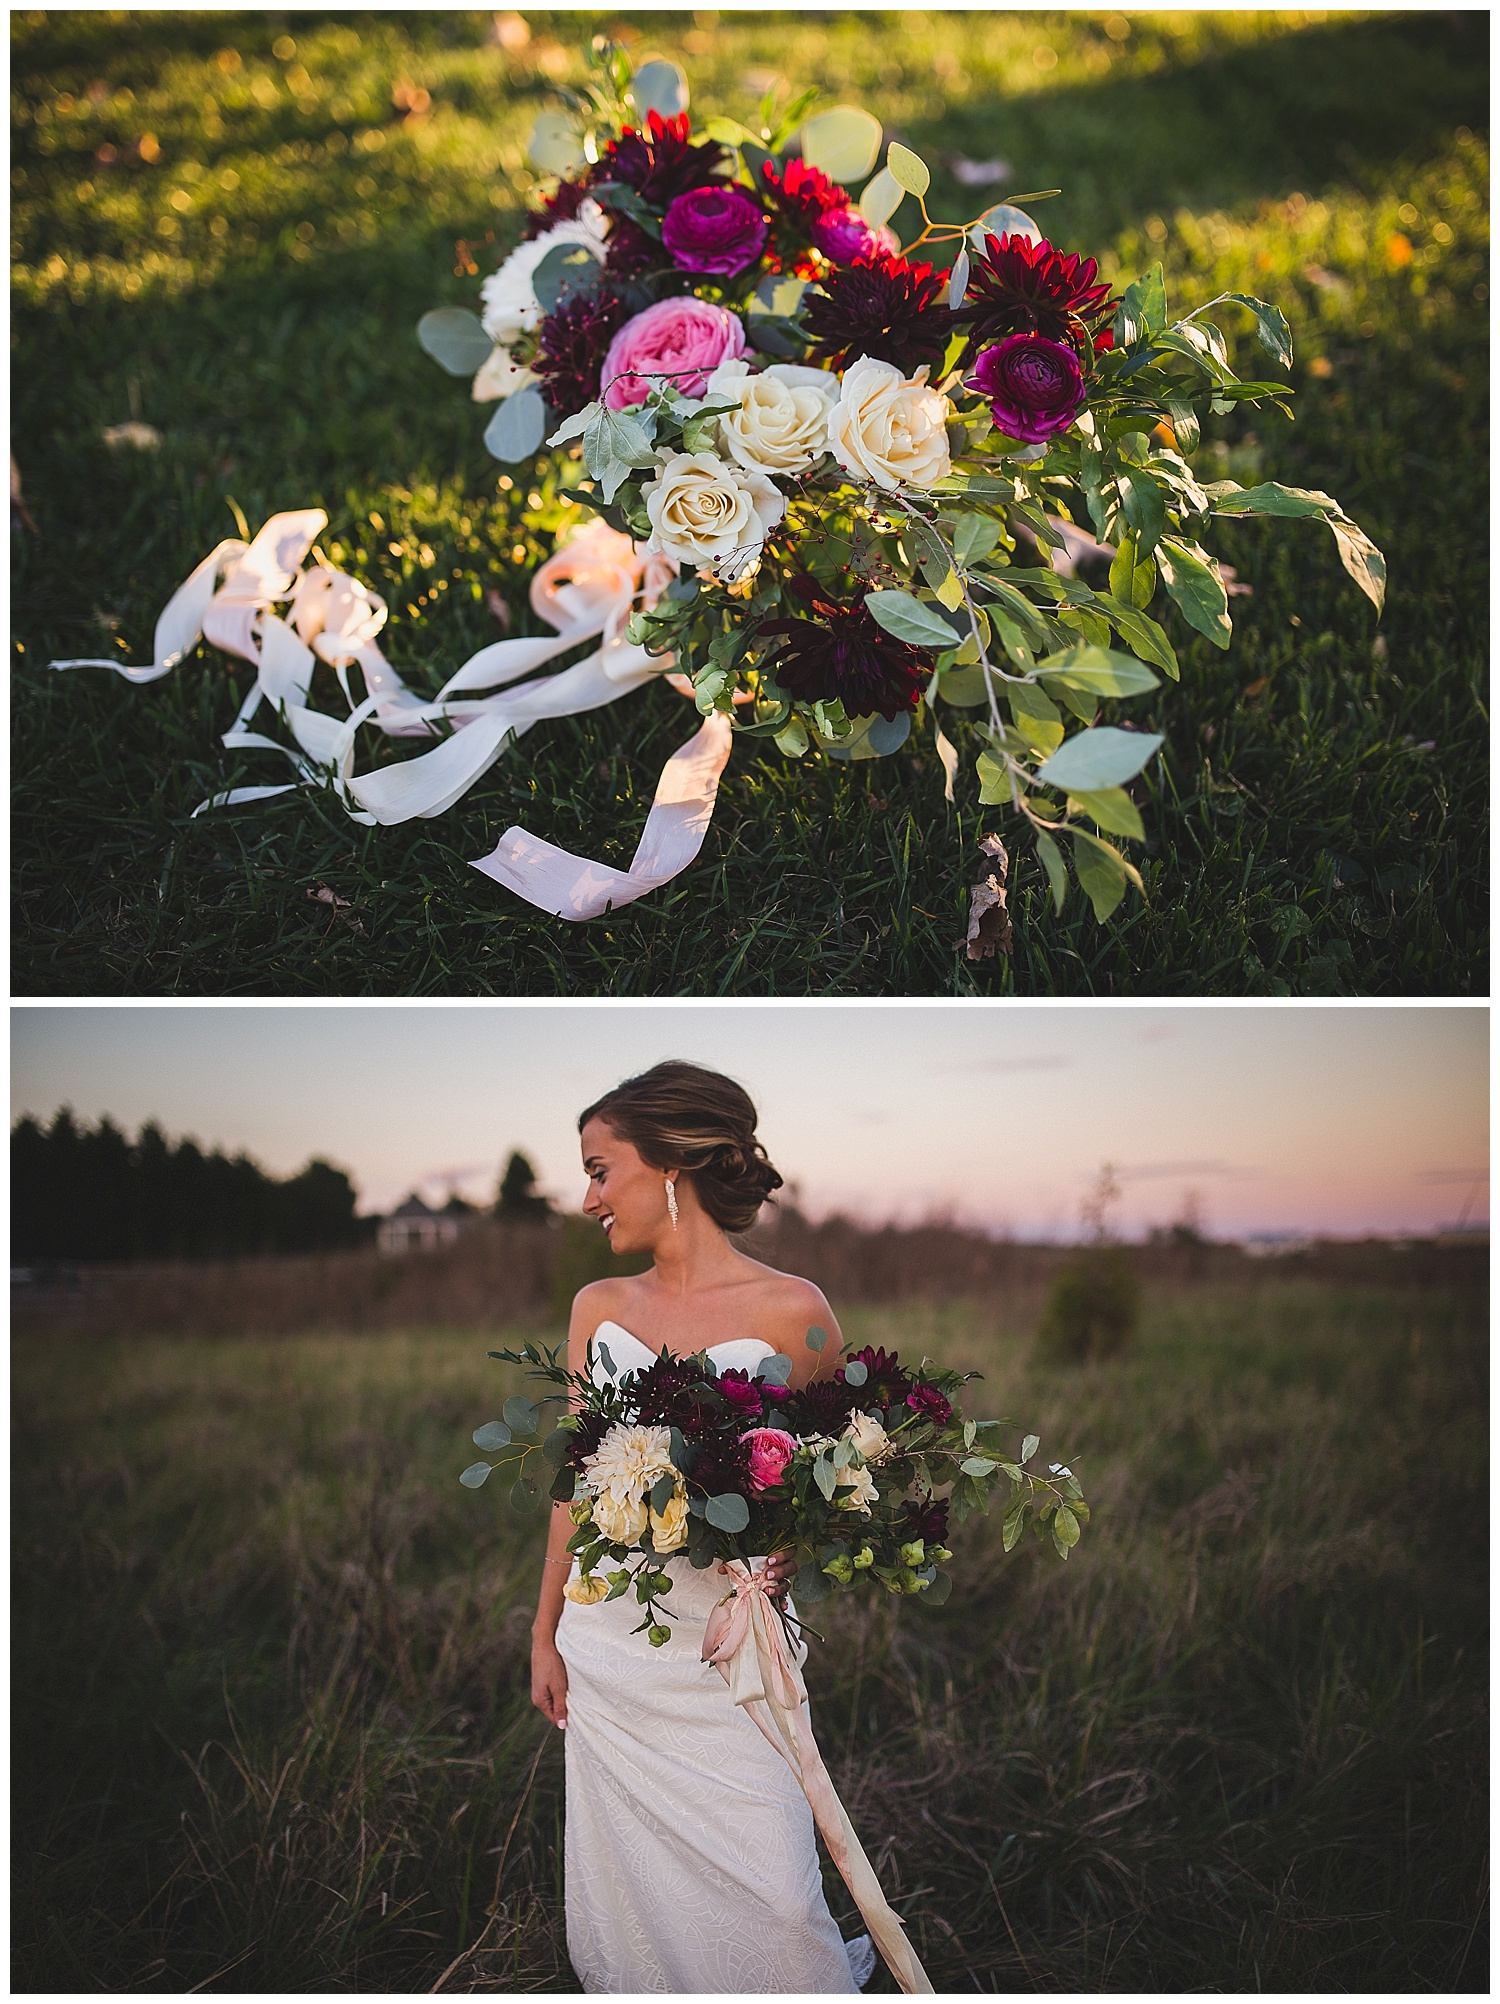 EmilyRogers-southwest-virginia-creative-wedding-photographer_0194.jpg